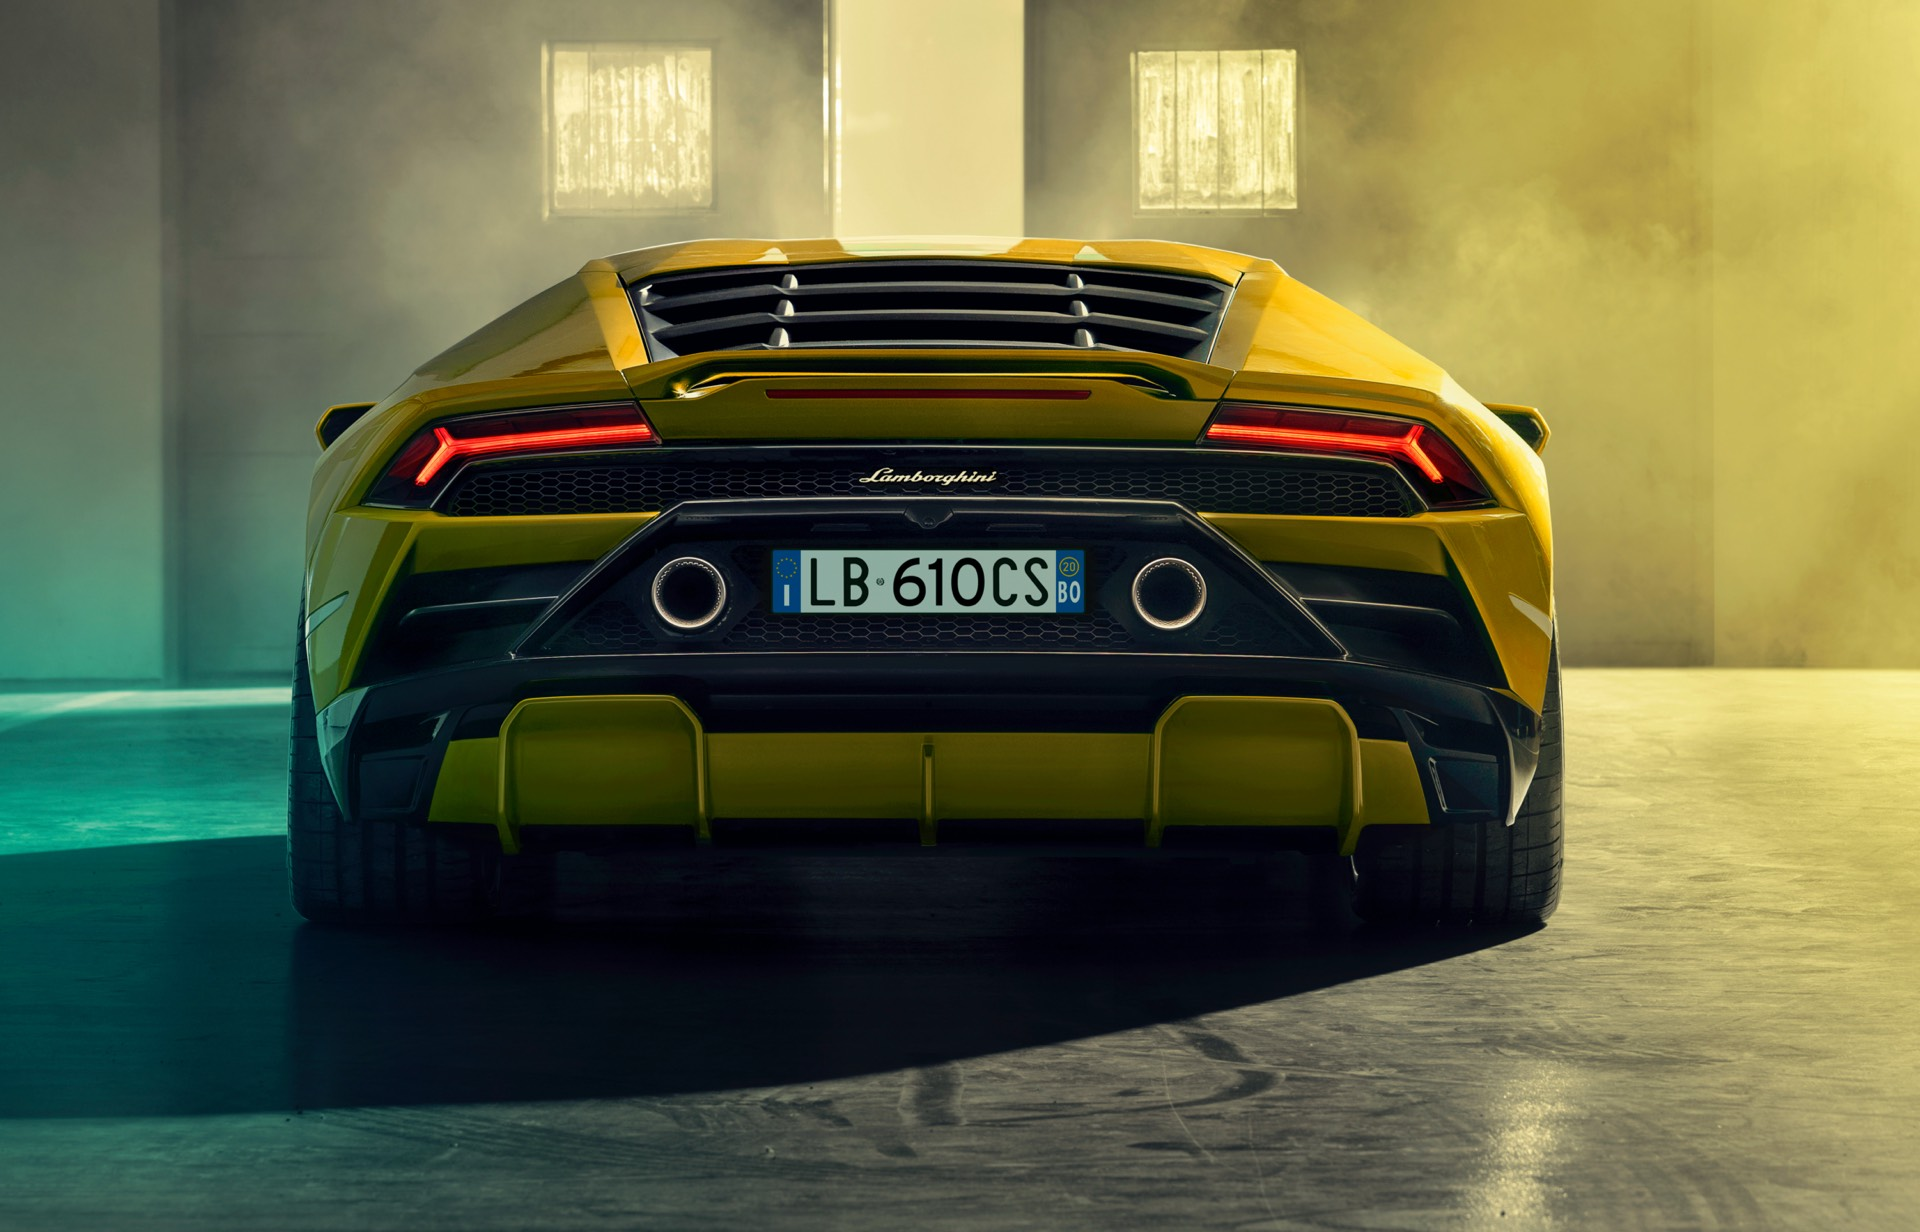 Lamborghini Huracan EVO Rear Wheel Drive Diffuser